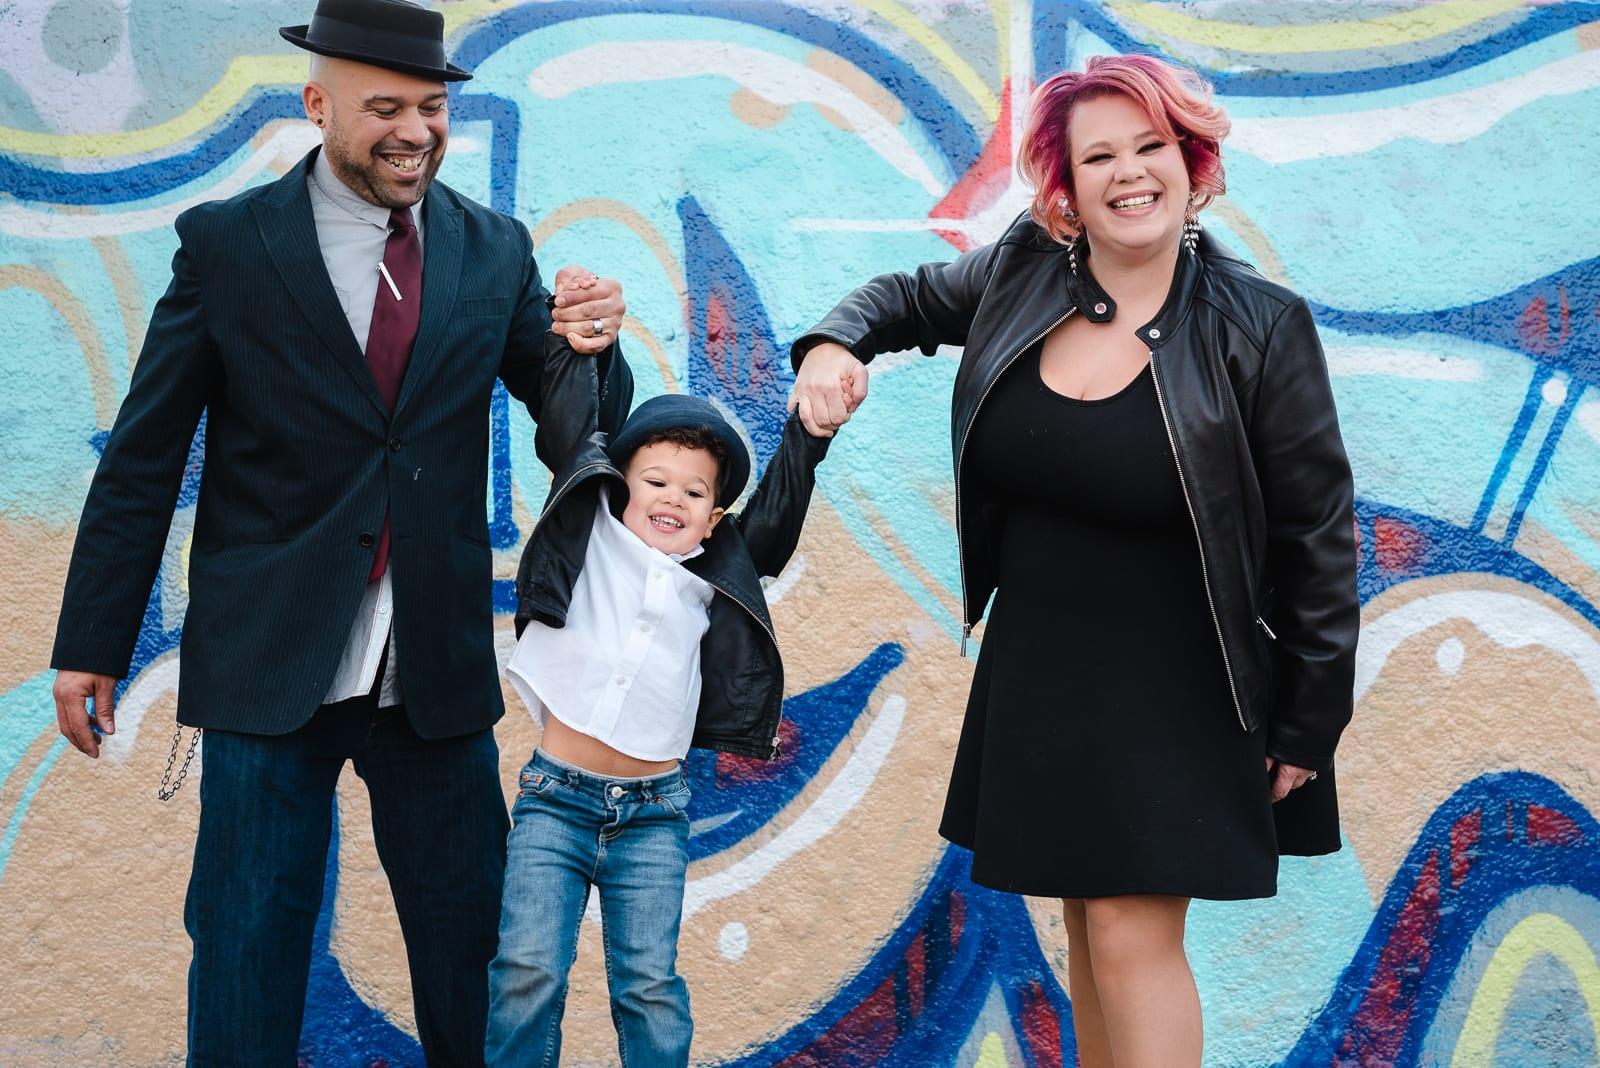 Fun Family Photo | Family Photos | Scott Carpenter Park | From the Hip Photo